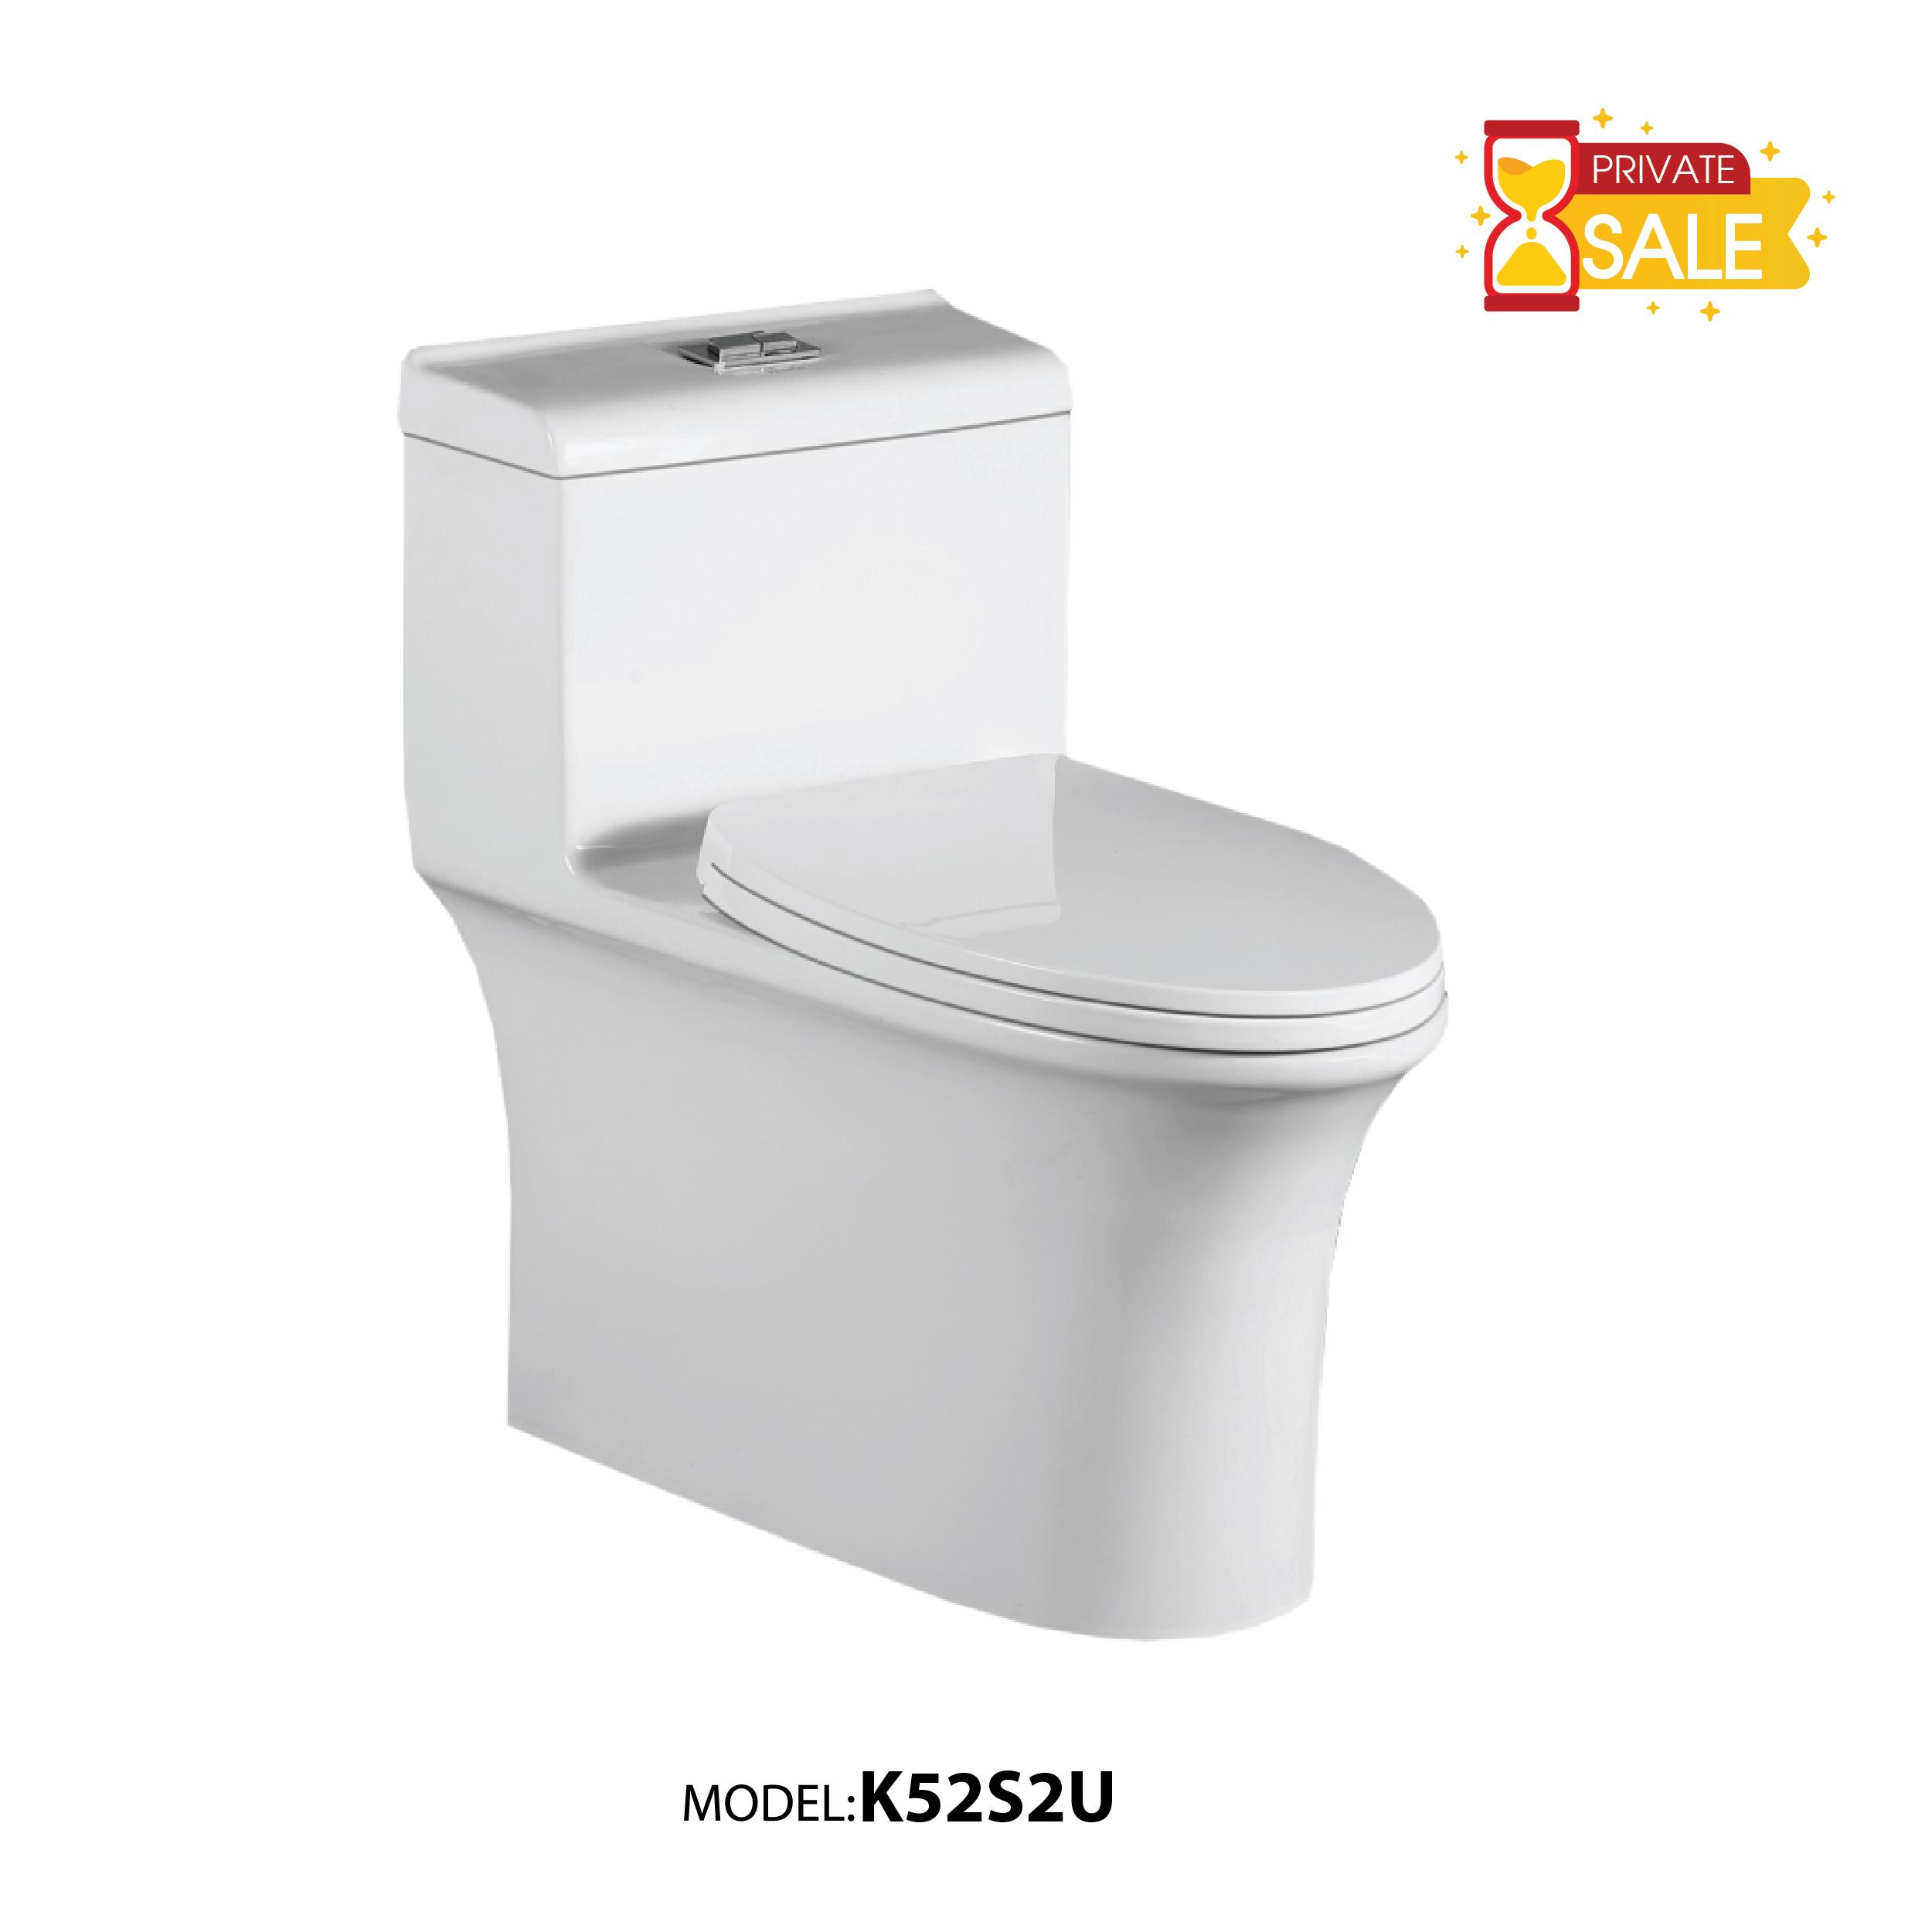 BỒN CẦU CARANO 1 KHỐI K52S2U (Toilet model: K52S2U)